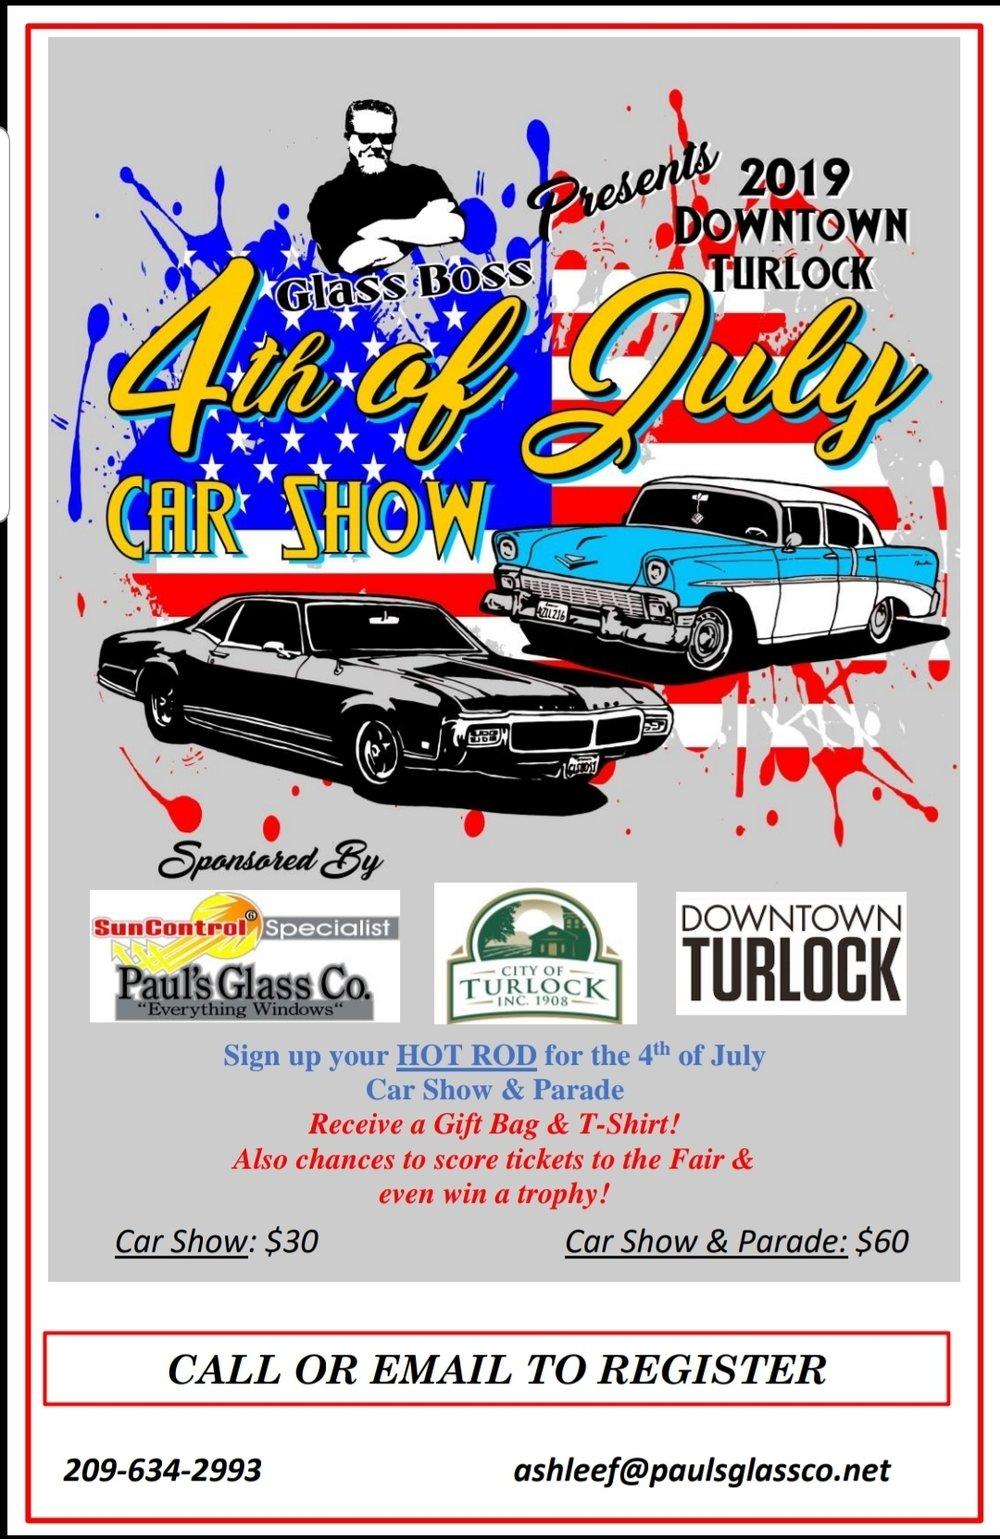 Turlock Christmas Parade 2019 Events — Downtown Turlock